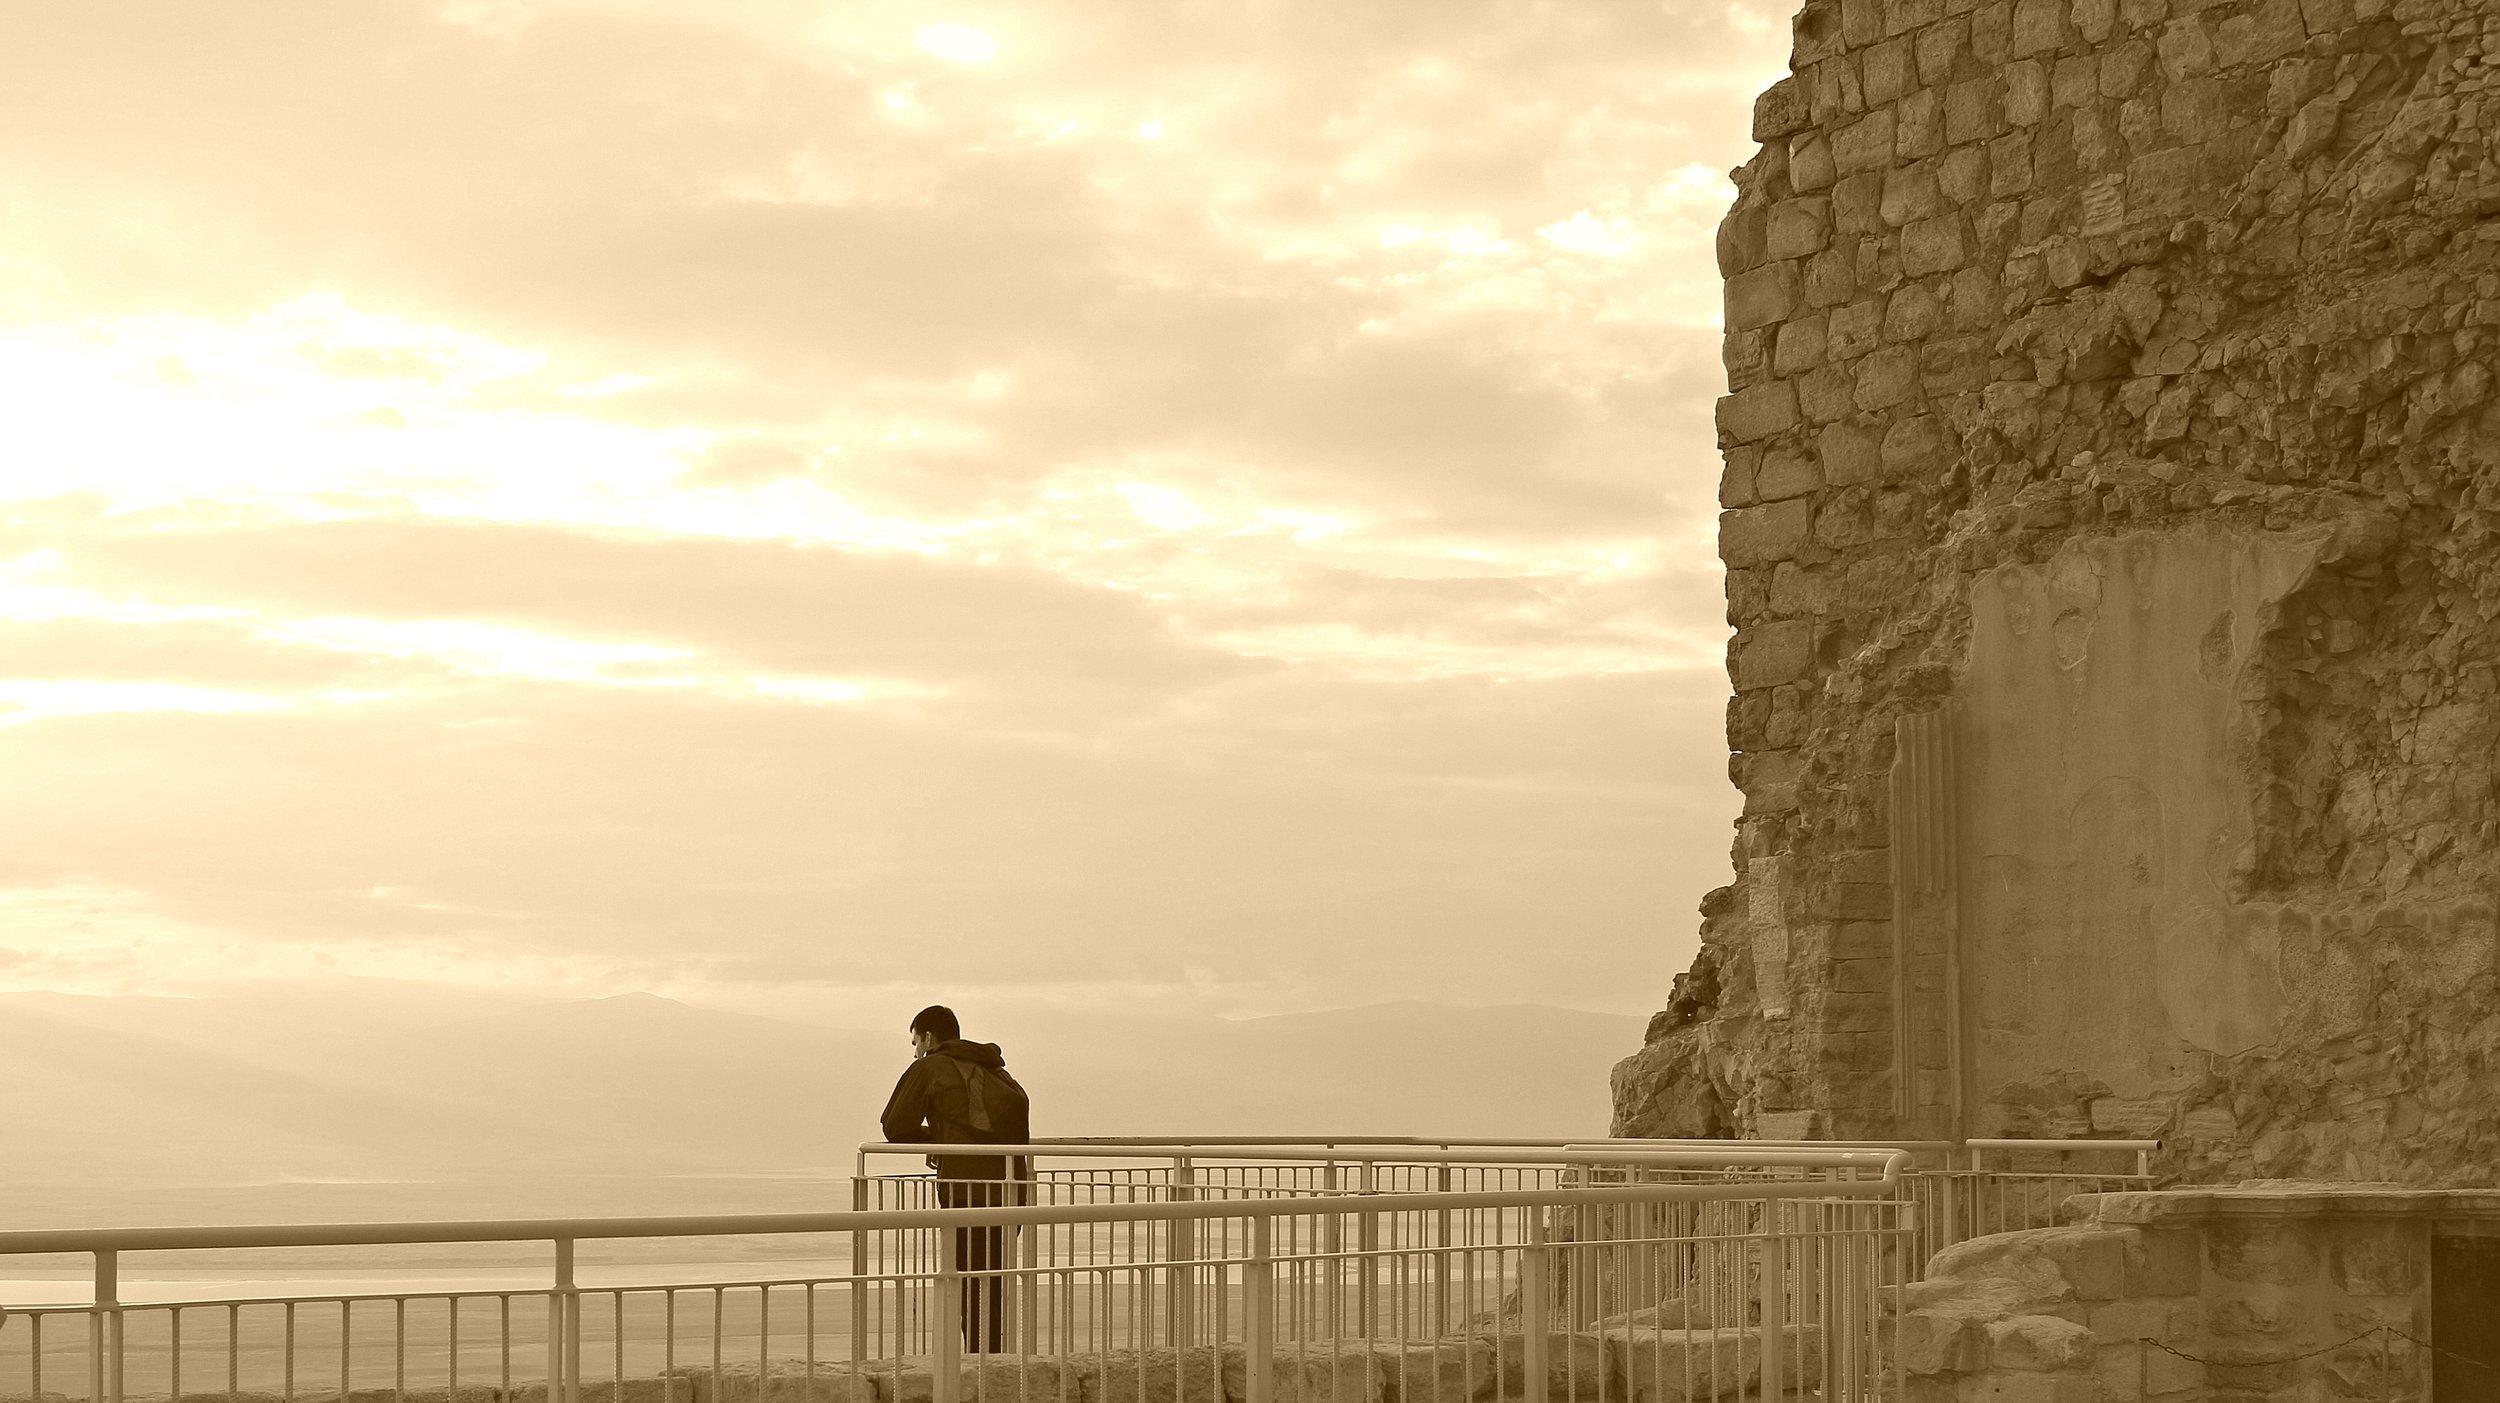 My Husband Overlooking the Dead Sea